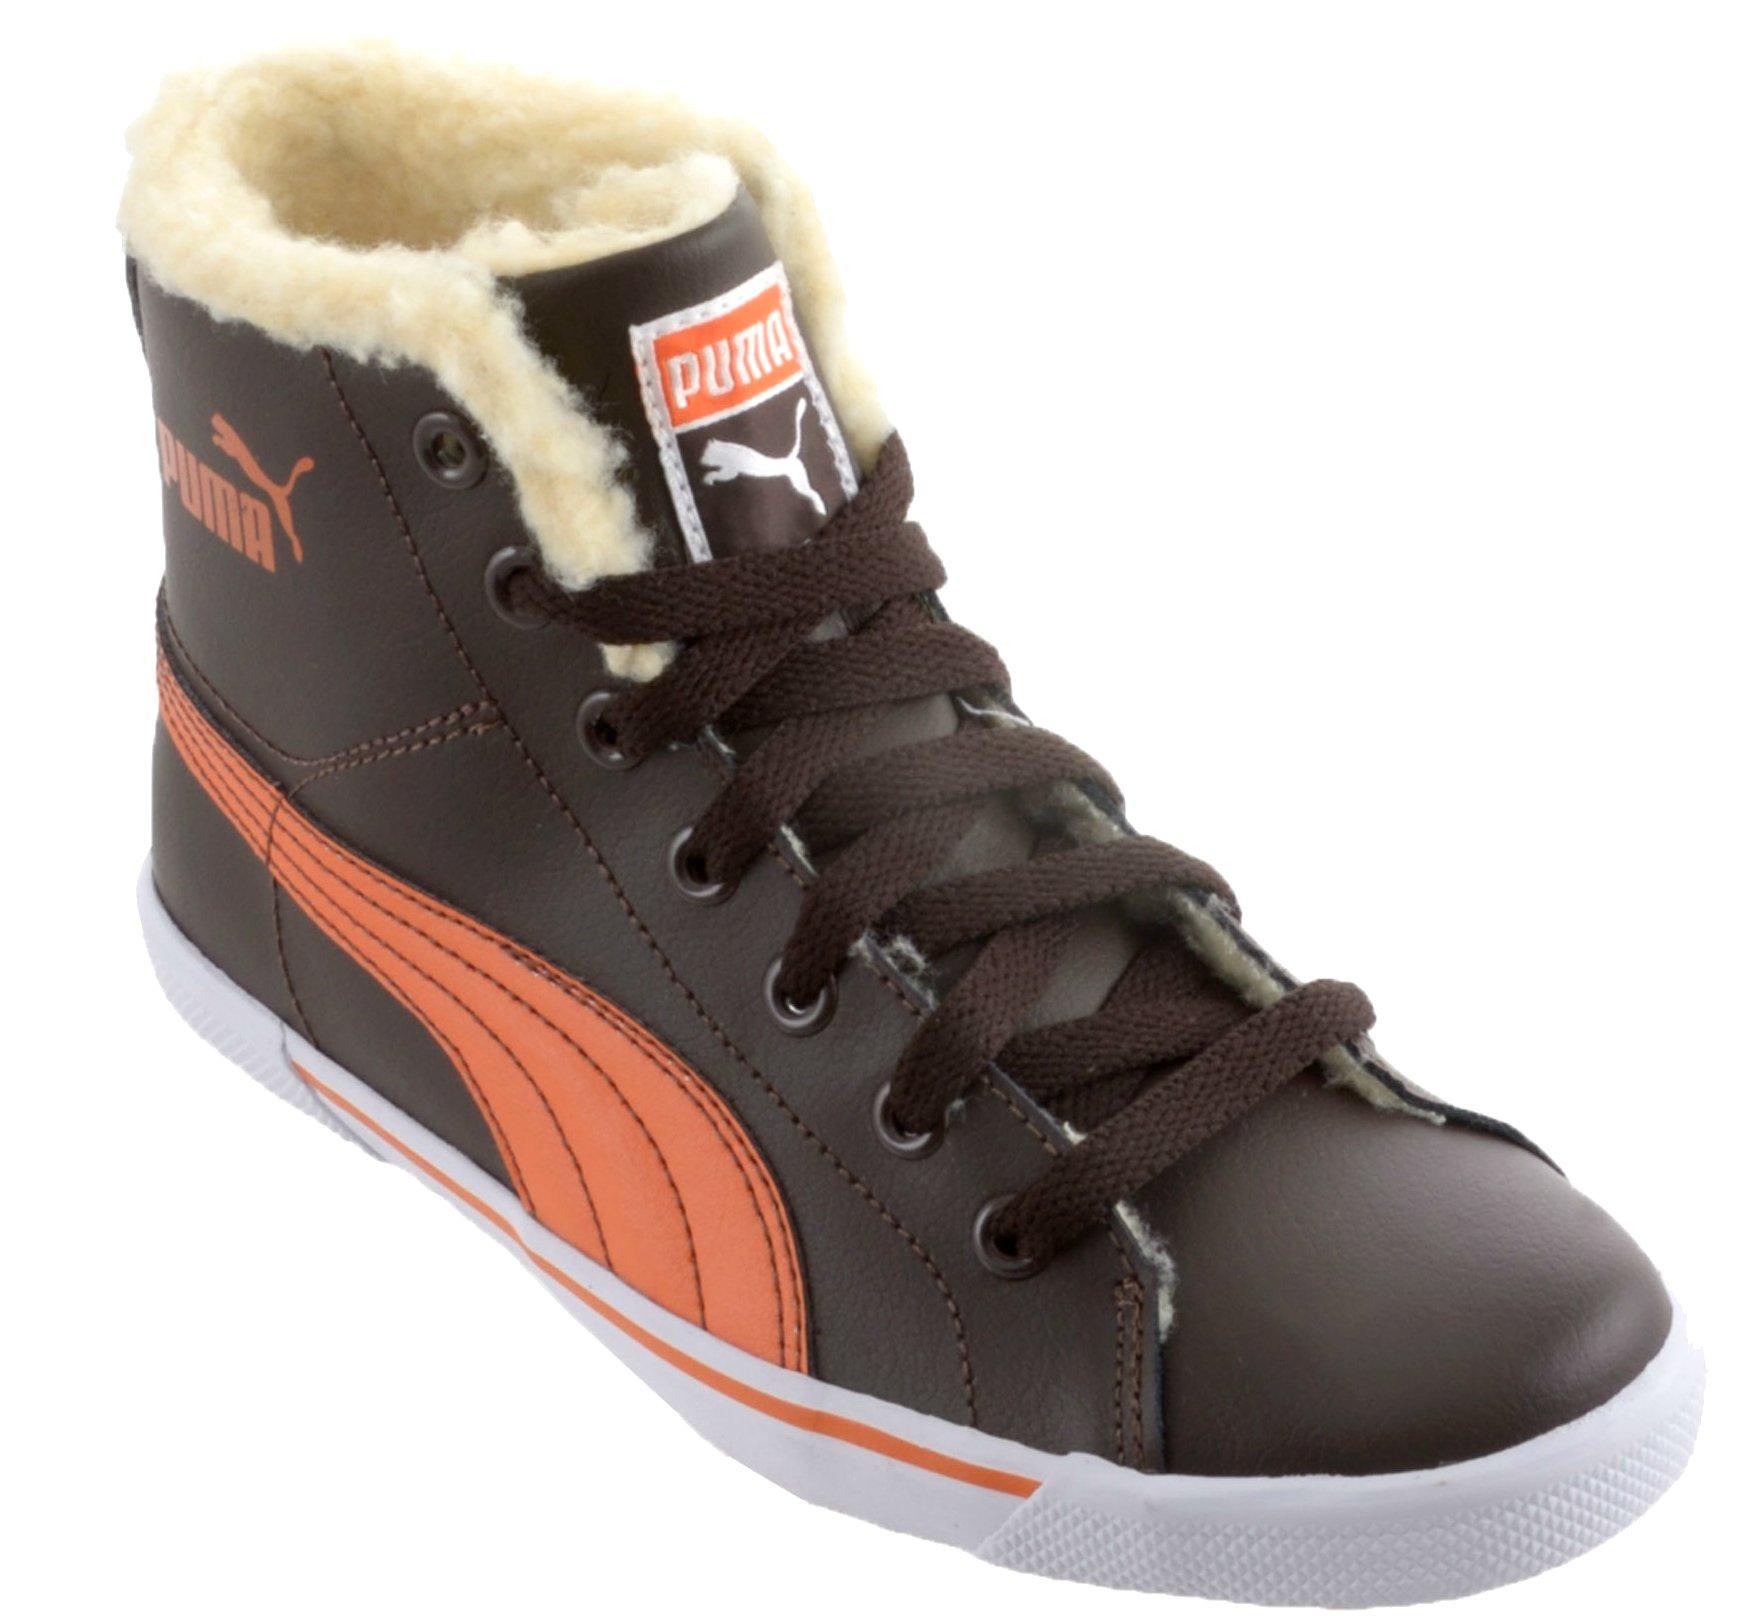 PUMA benecio mid zimowe buty ocieplane skora 34,5